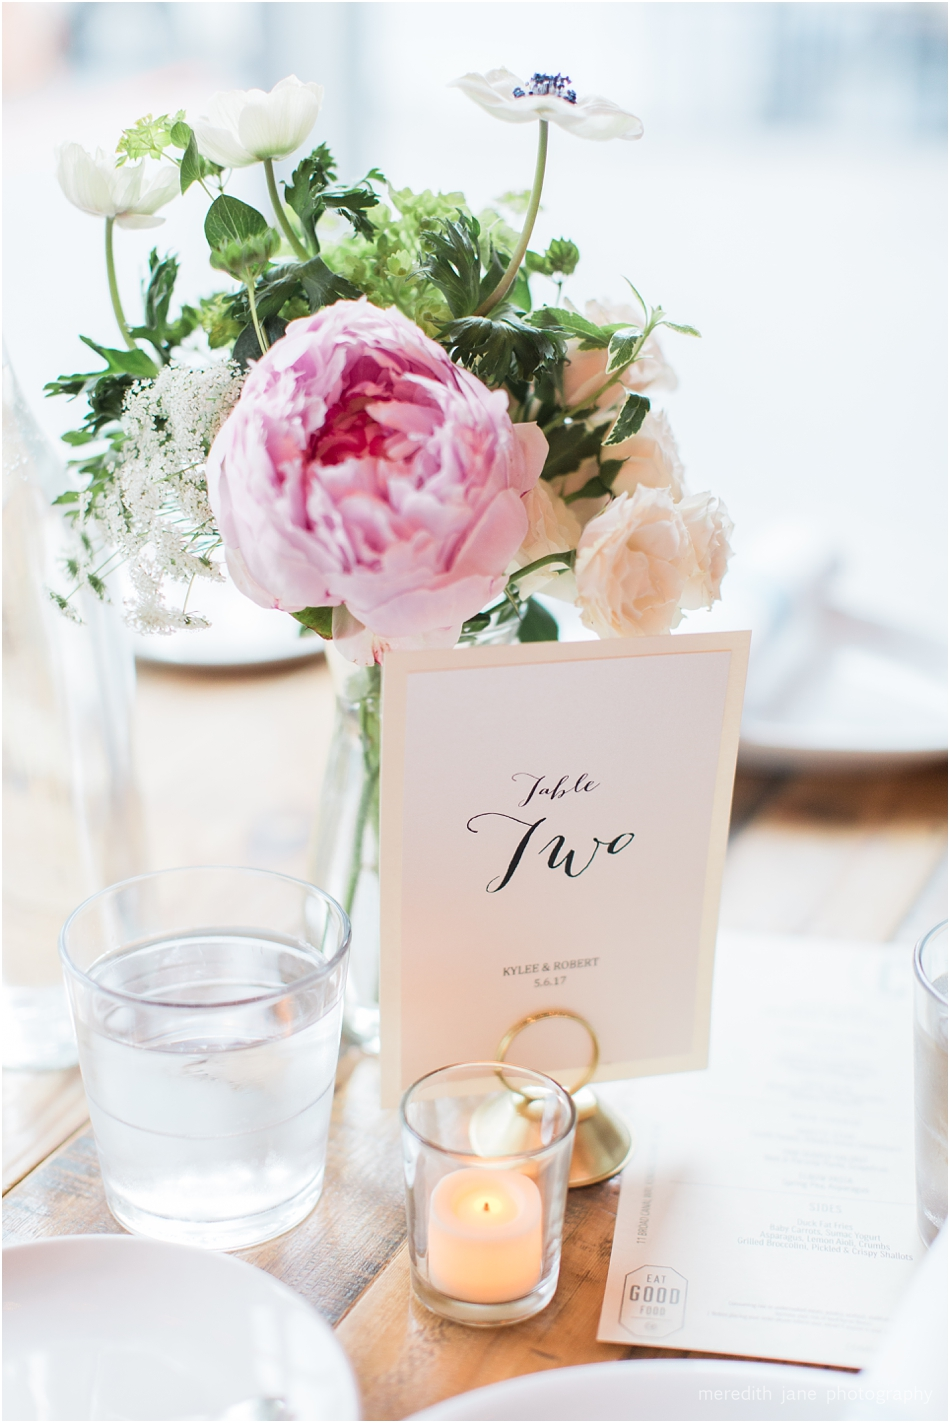 commonwealth_market_restaurant_roofdeck_ceremony_cambridge_boston_massachusetts_cape_cod_new_england_wedding_photographer_Meredith_Jane_Photography_photo_1364.jpg